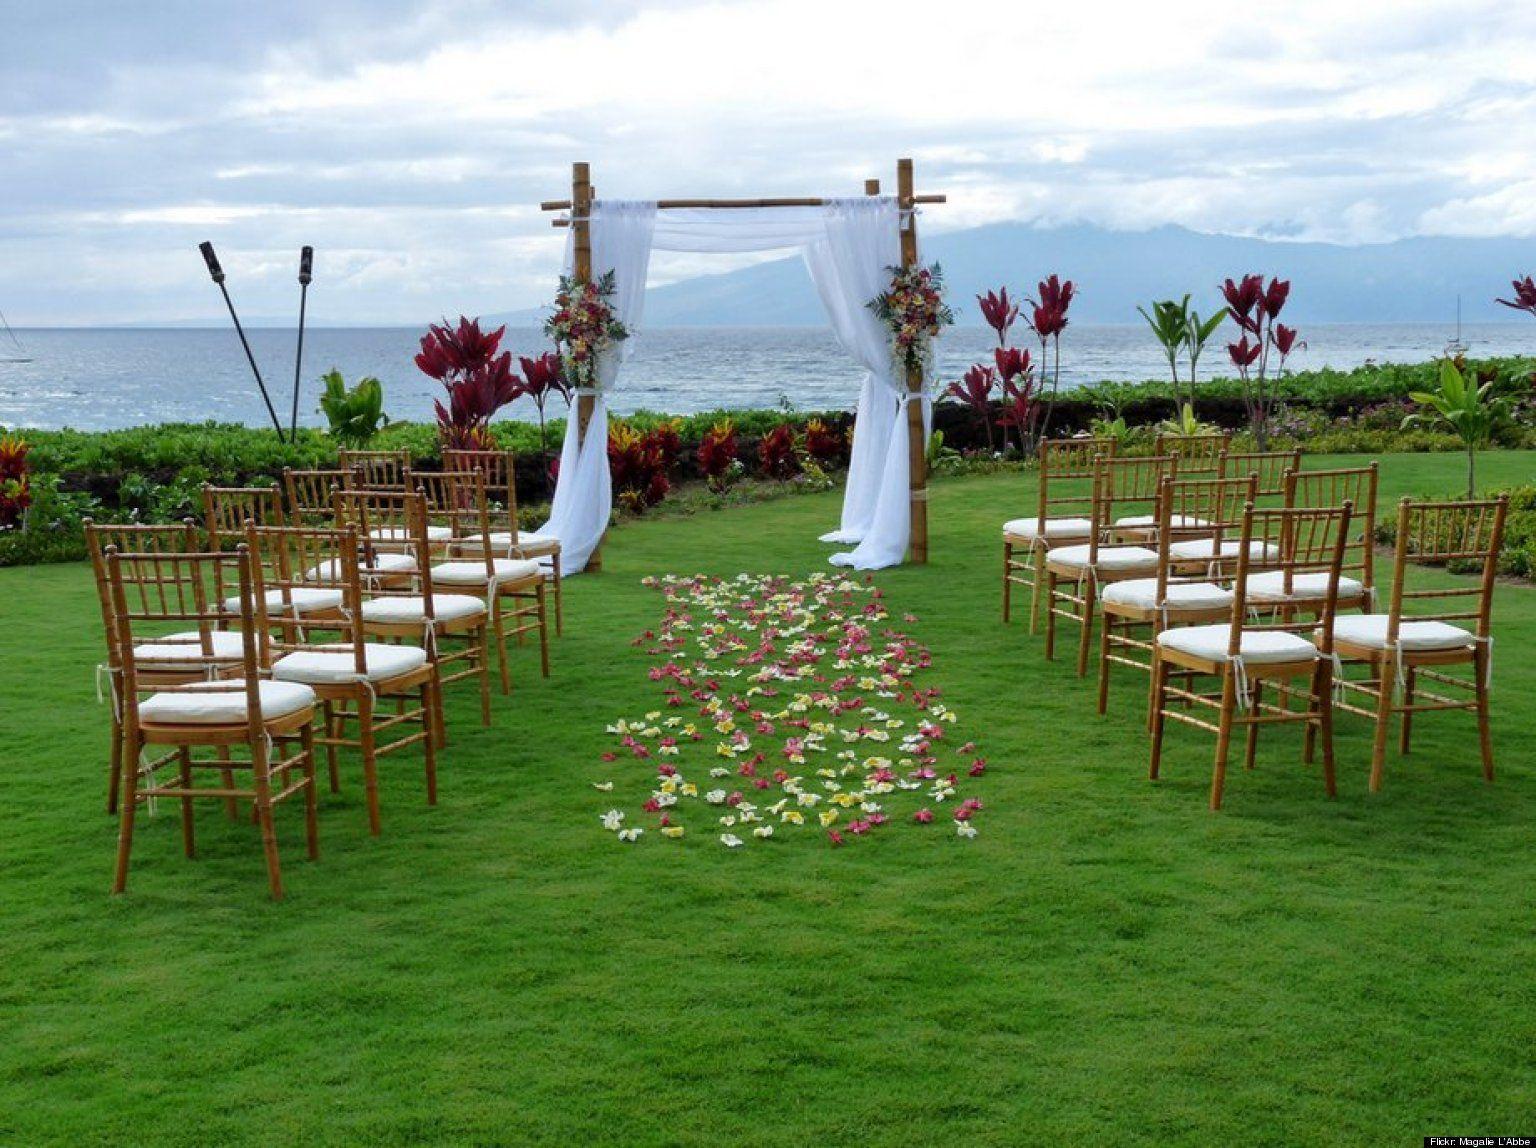 10 Small Garden Wedding Ideas Most Awesome And Attractive Pernikahan Kecil Tempat Pernikahan Perkawinan Sederhana